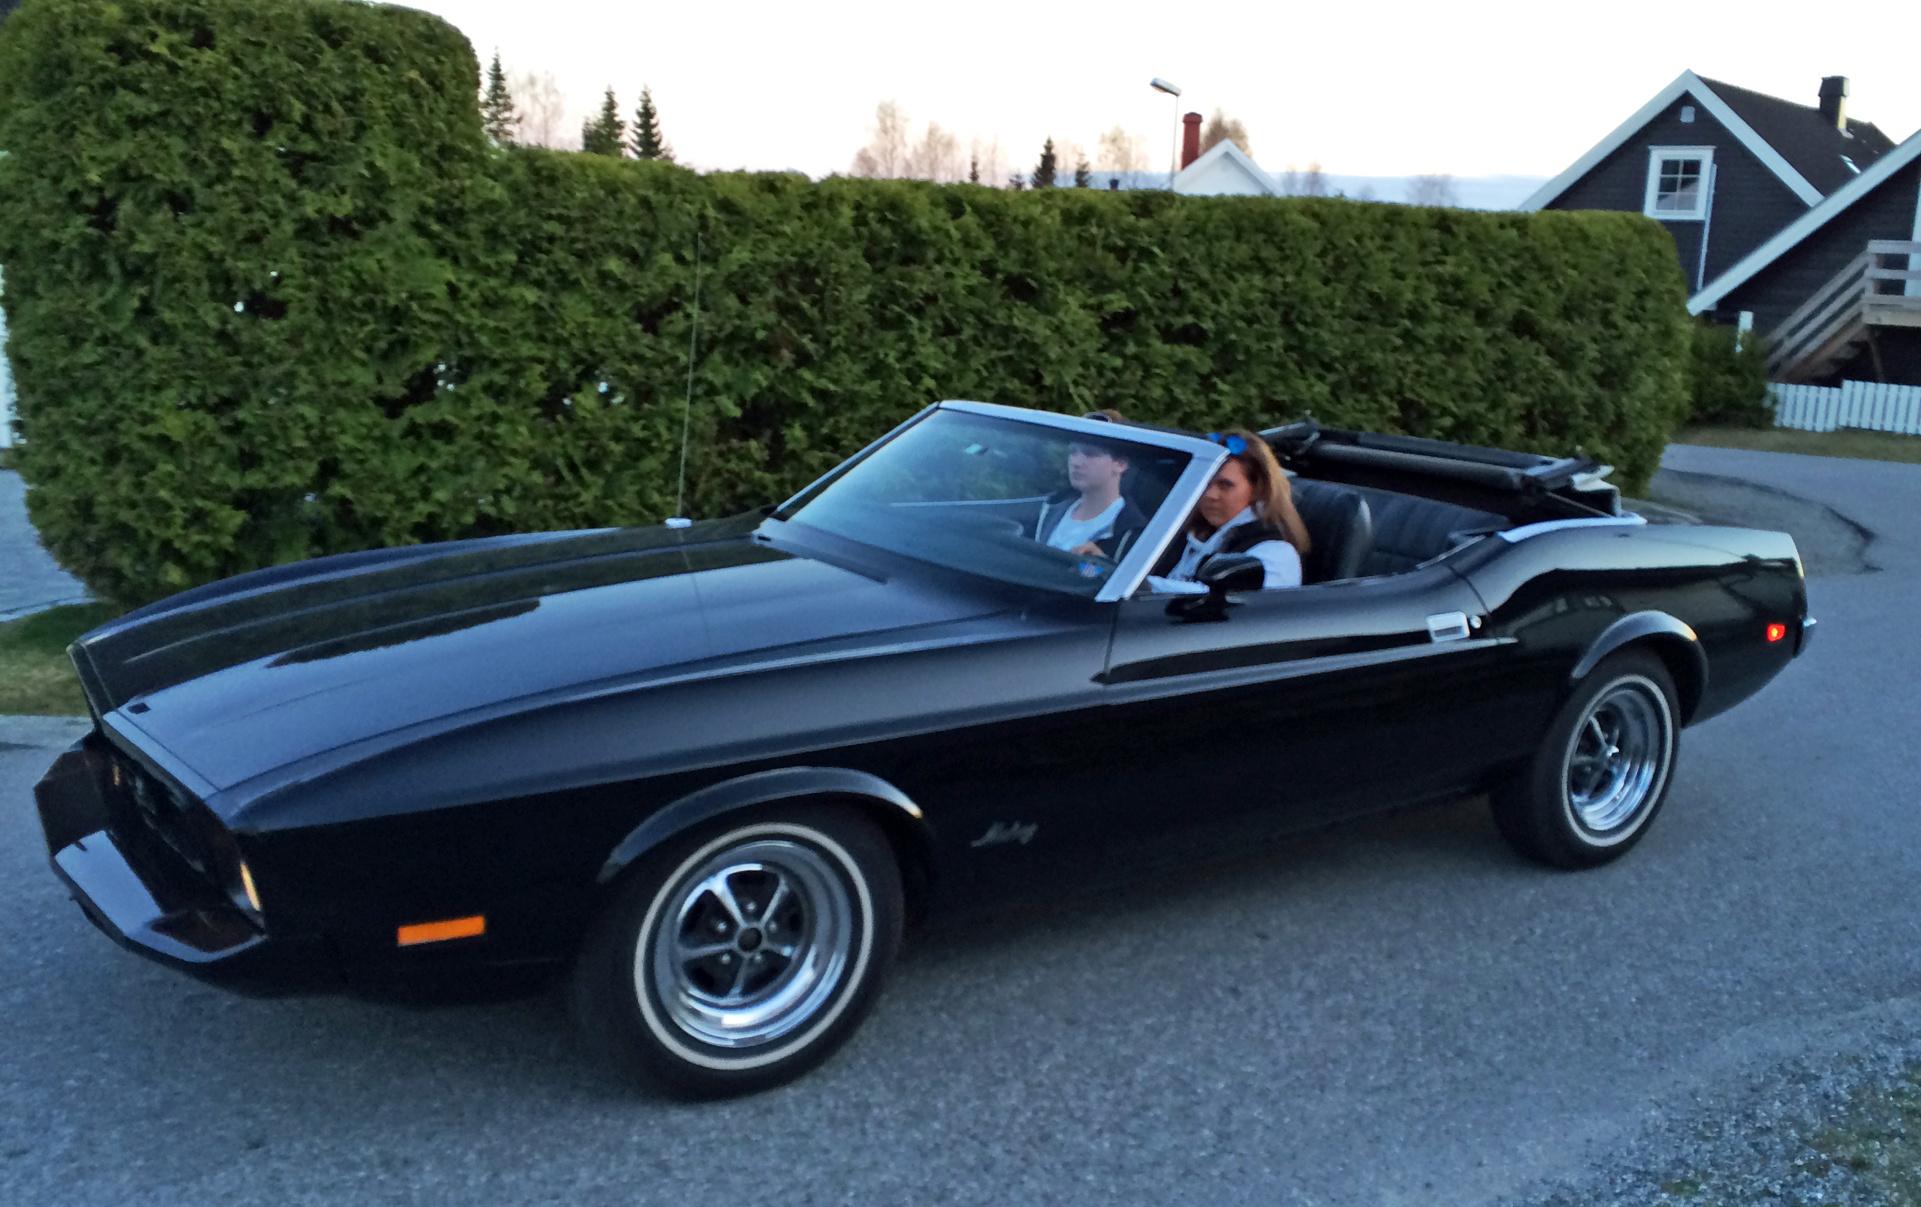 146-1973 Ford Mustang convertible 01. Eier- medlem